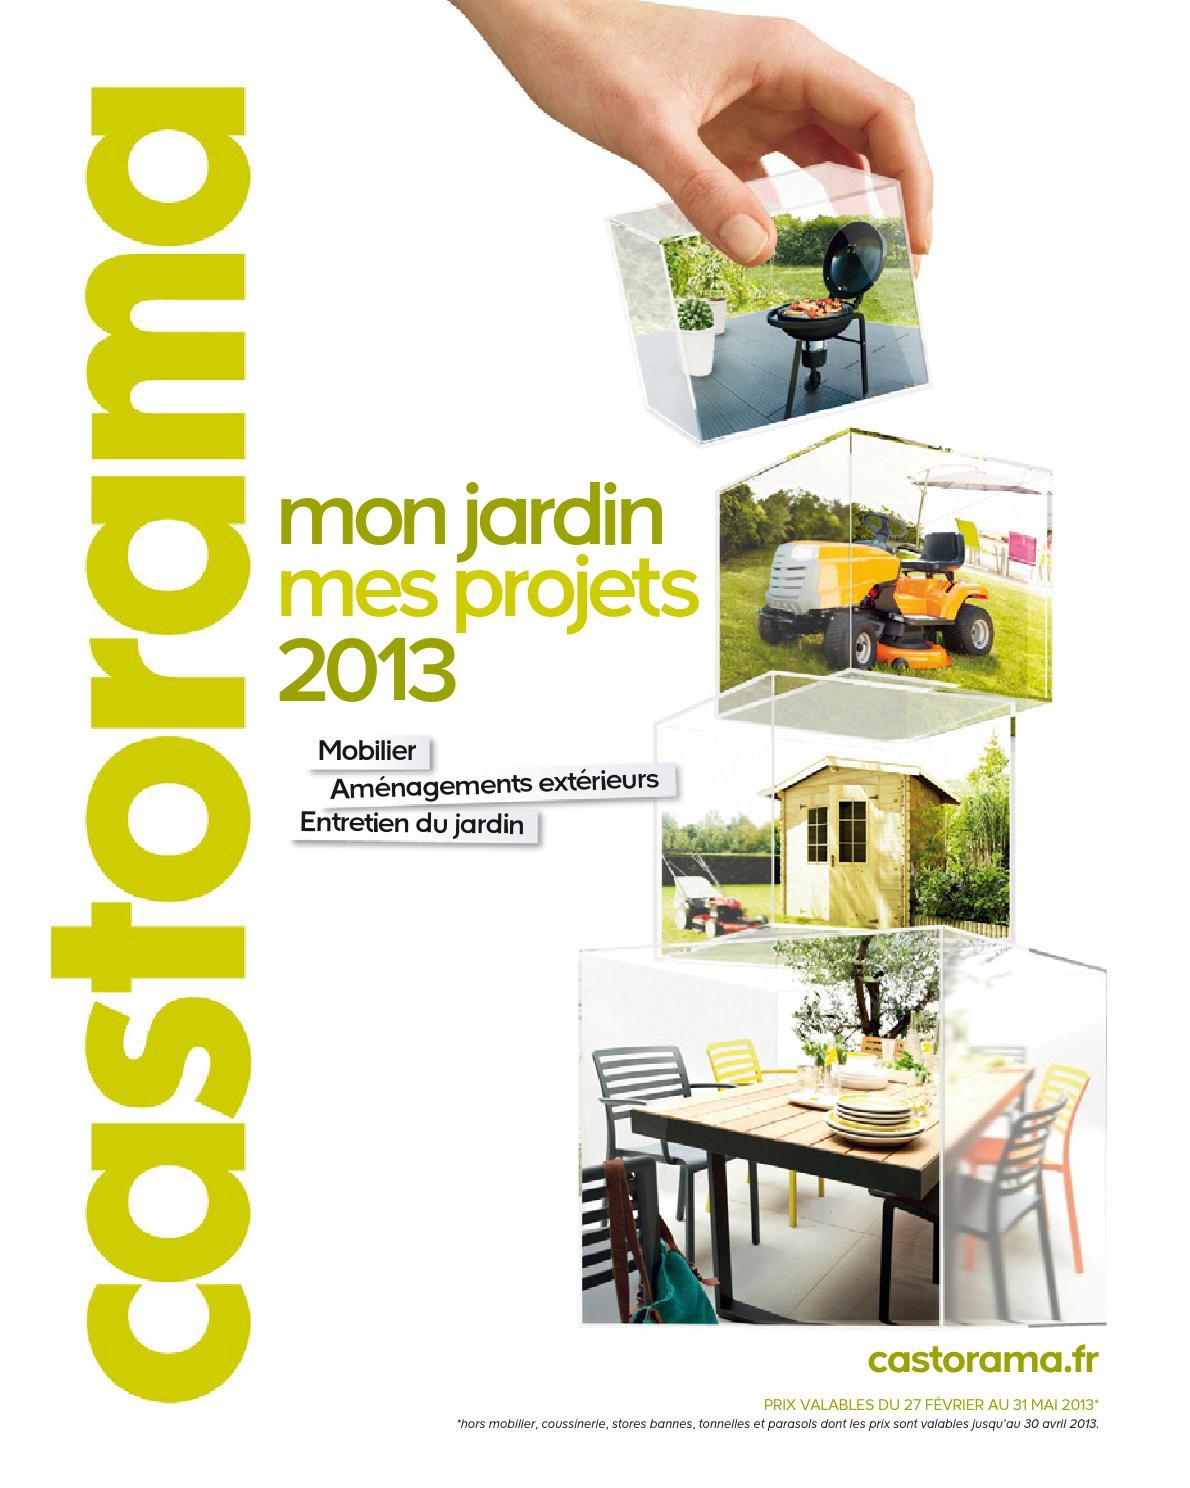 Catalogue Castorama Jardin Projets By Margot Ziegler - Issuu destiné Epdm Toiture Castorama